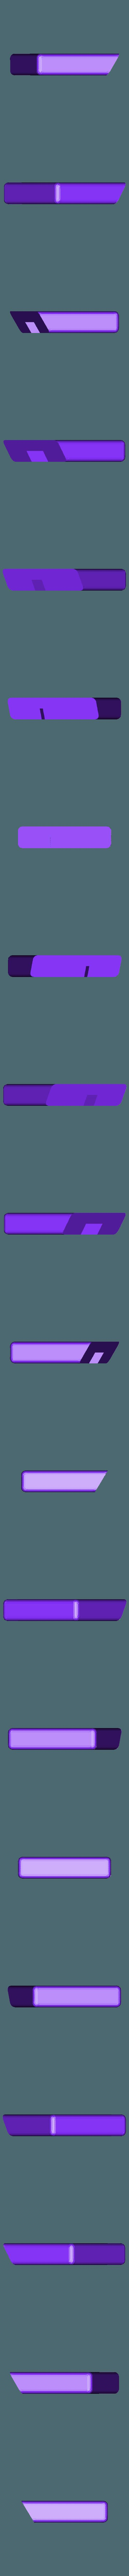 female.stl Download free STL file Belt buckle • 3D printable template, volpiclaudio